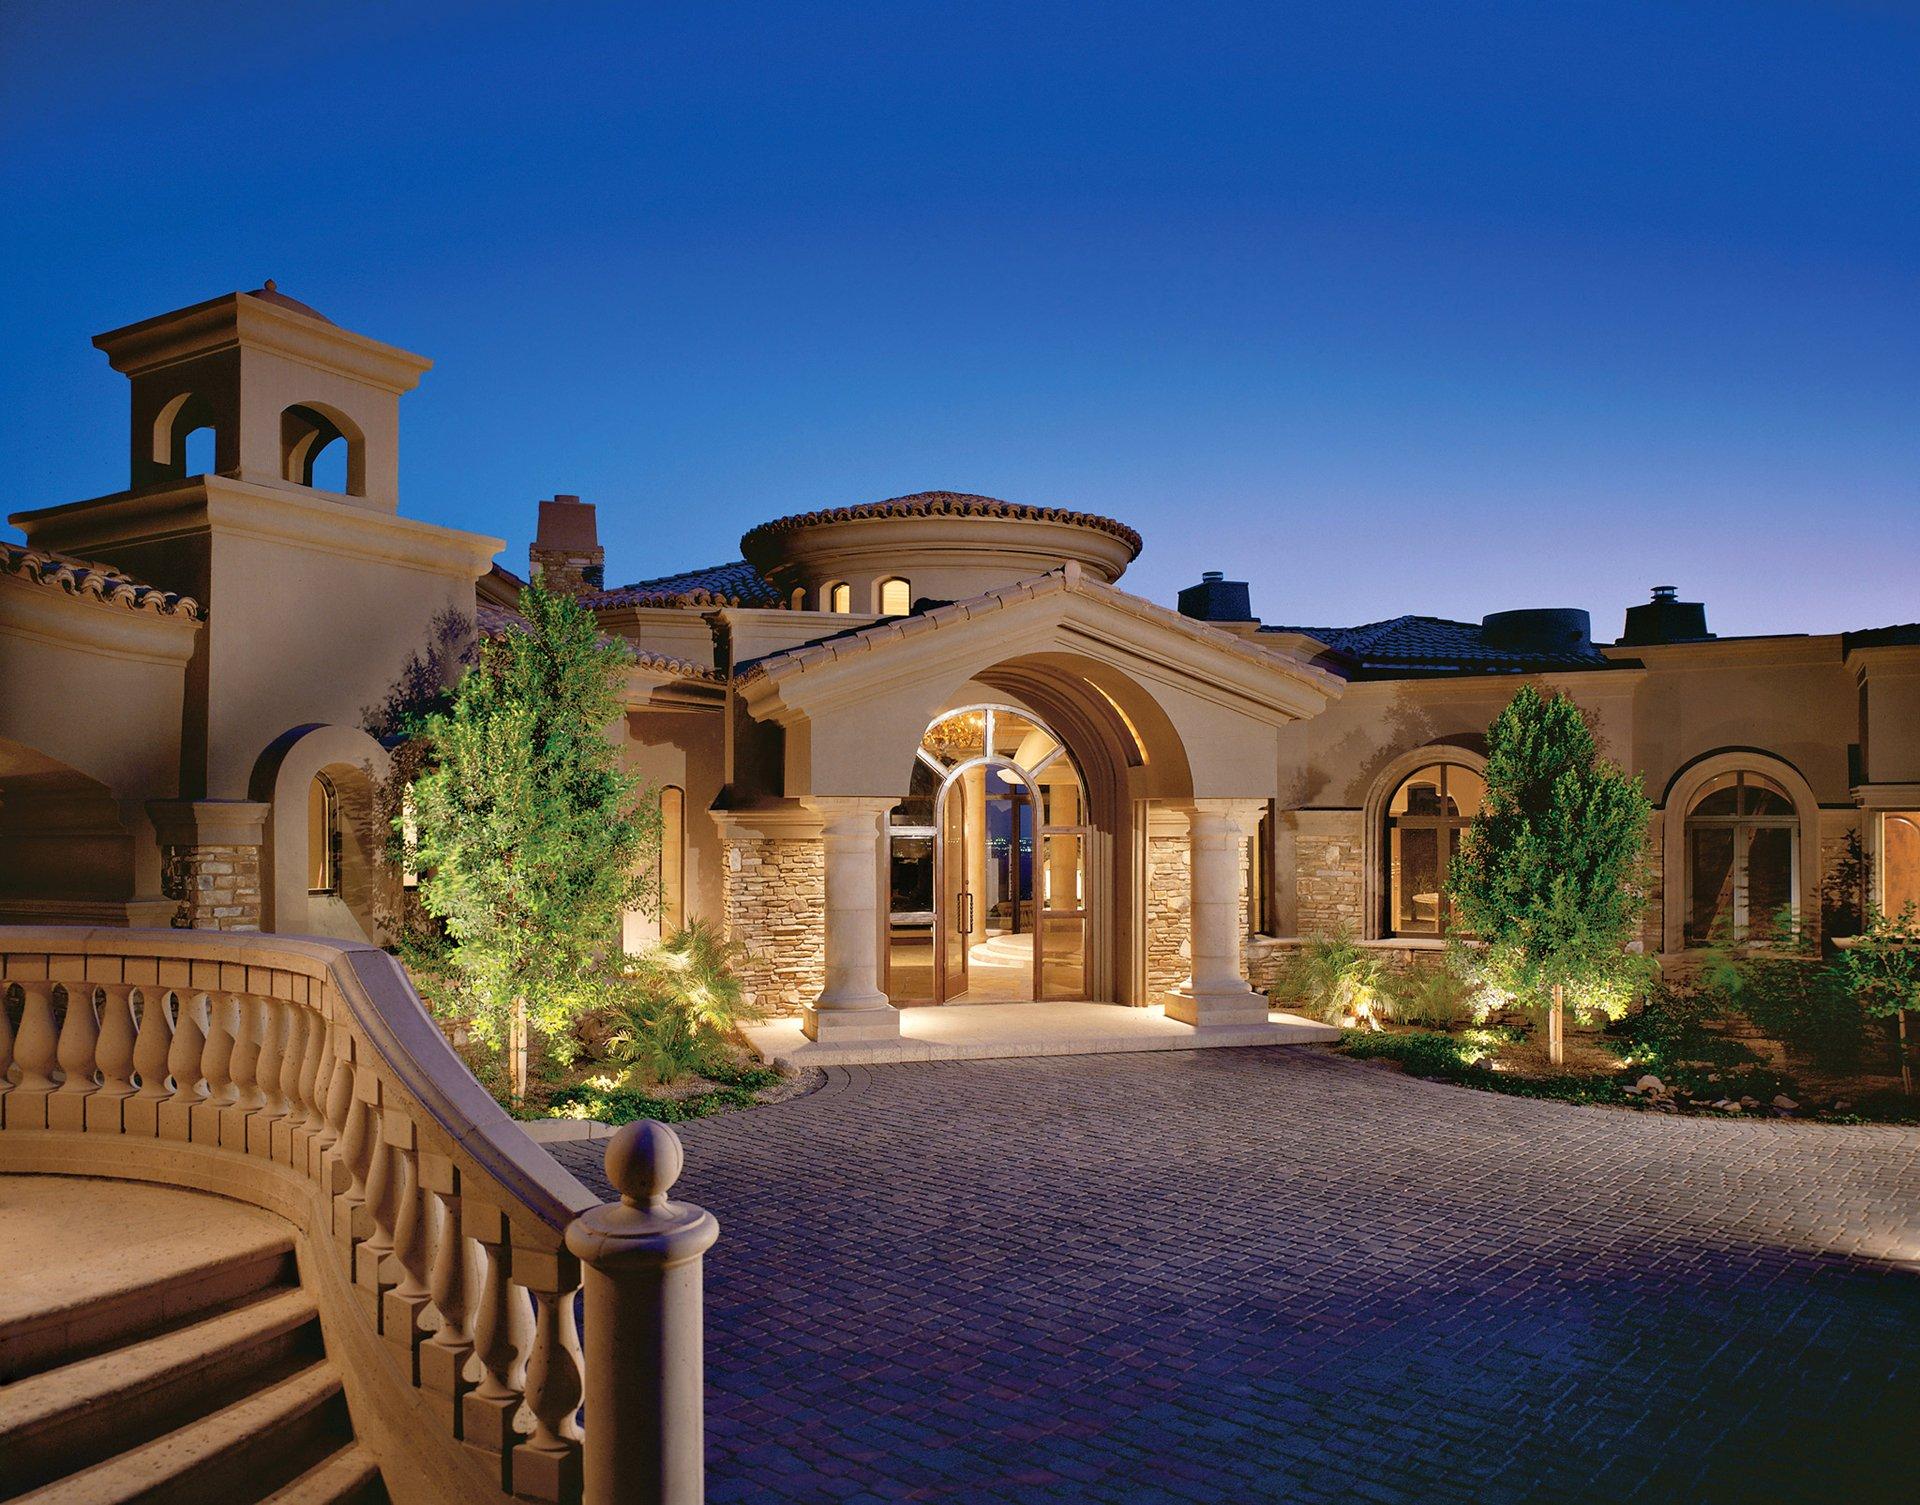 страны архитектура pittock mansion скачать